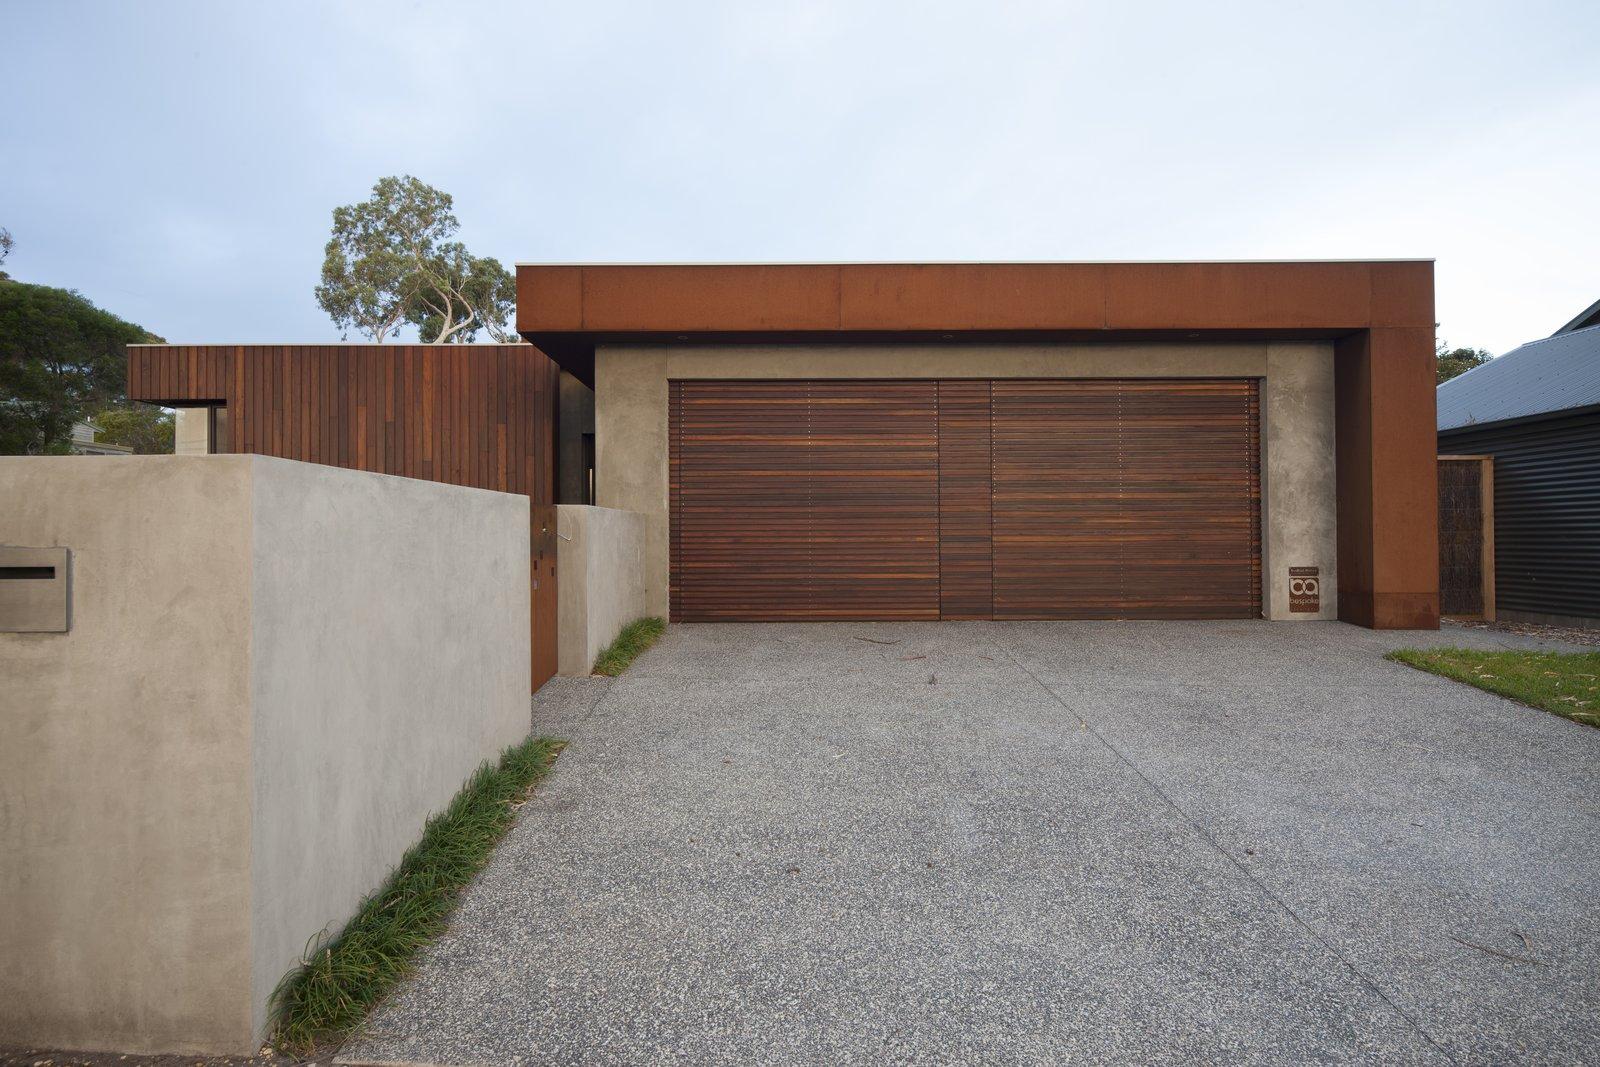 Spotted Gum Garage Doors and Coreten Eyelash Pod Residence by Bespoke Architects